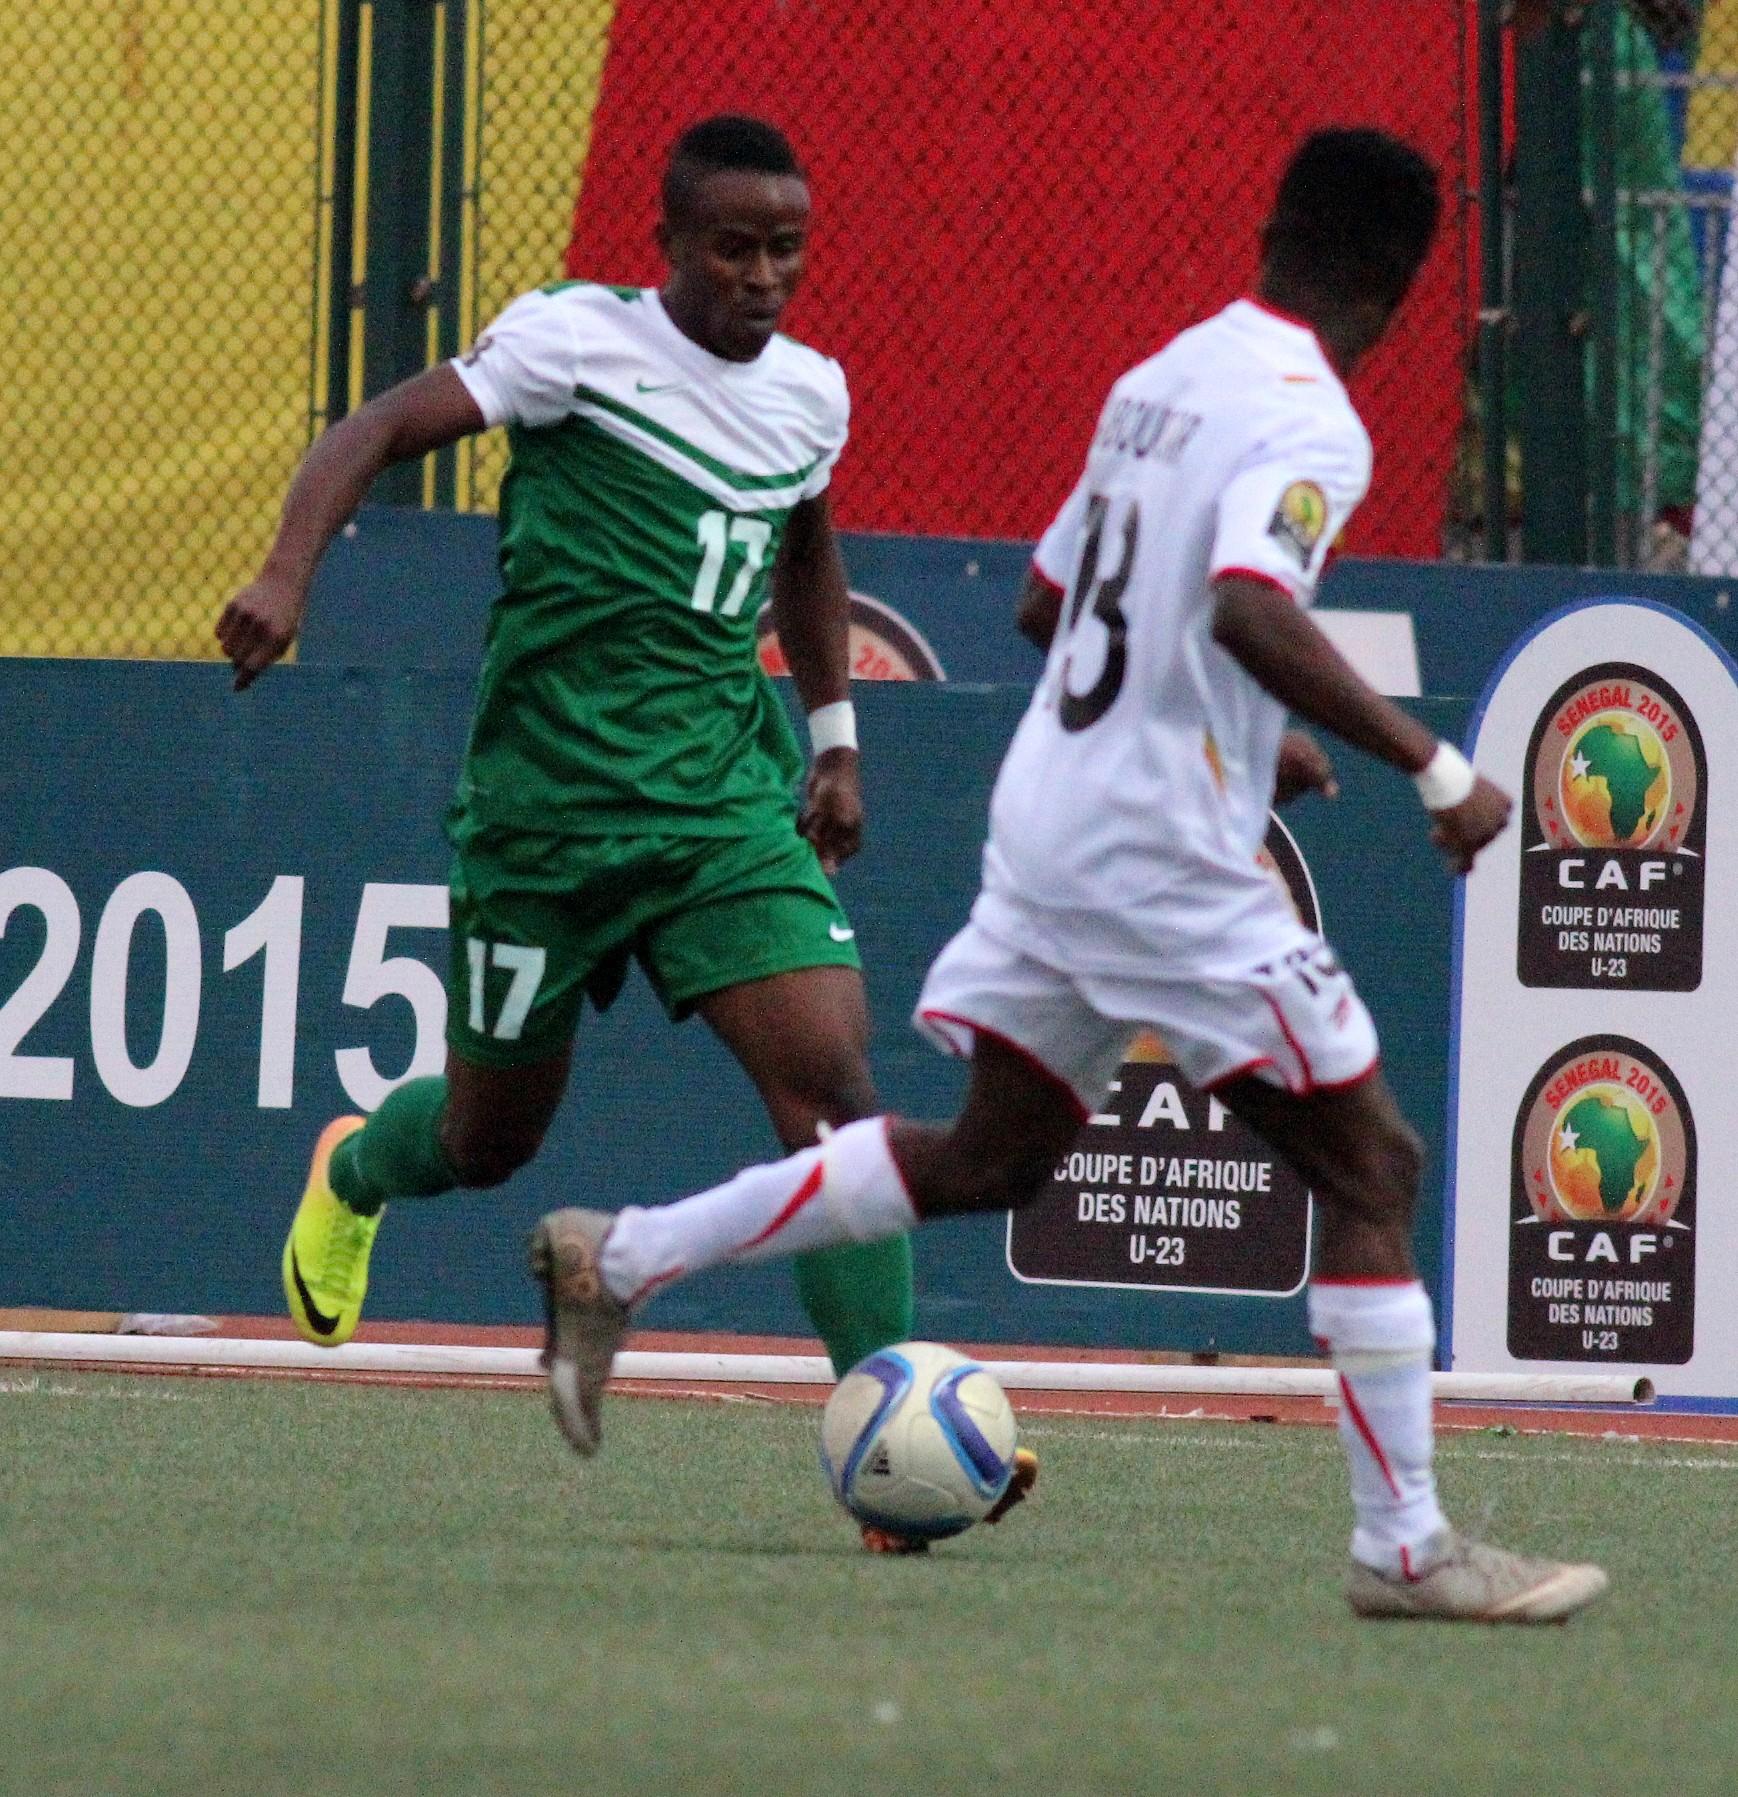 U-23 AFCON: Awoniyi, Okechukwu, Dimgba Return For Final